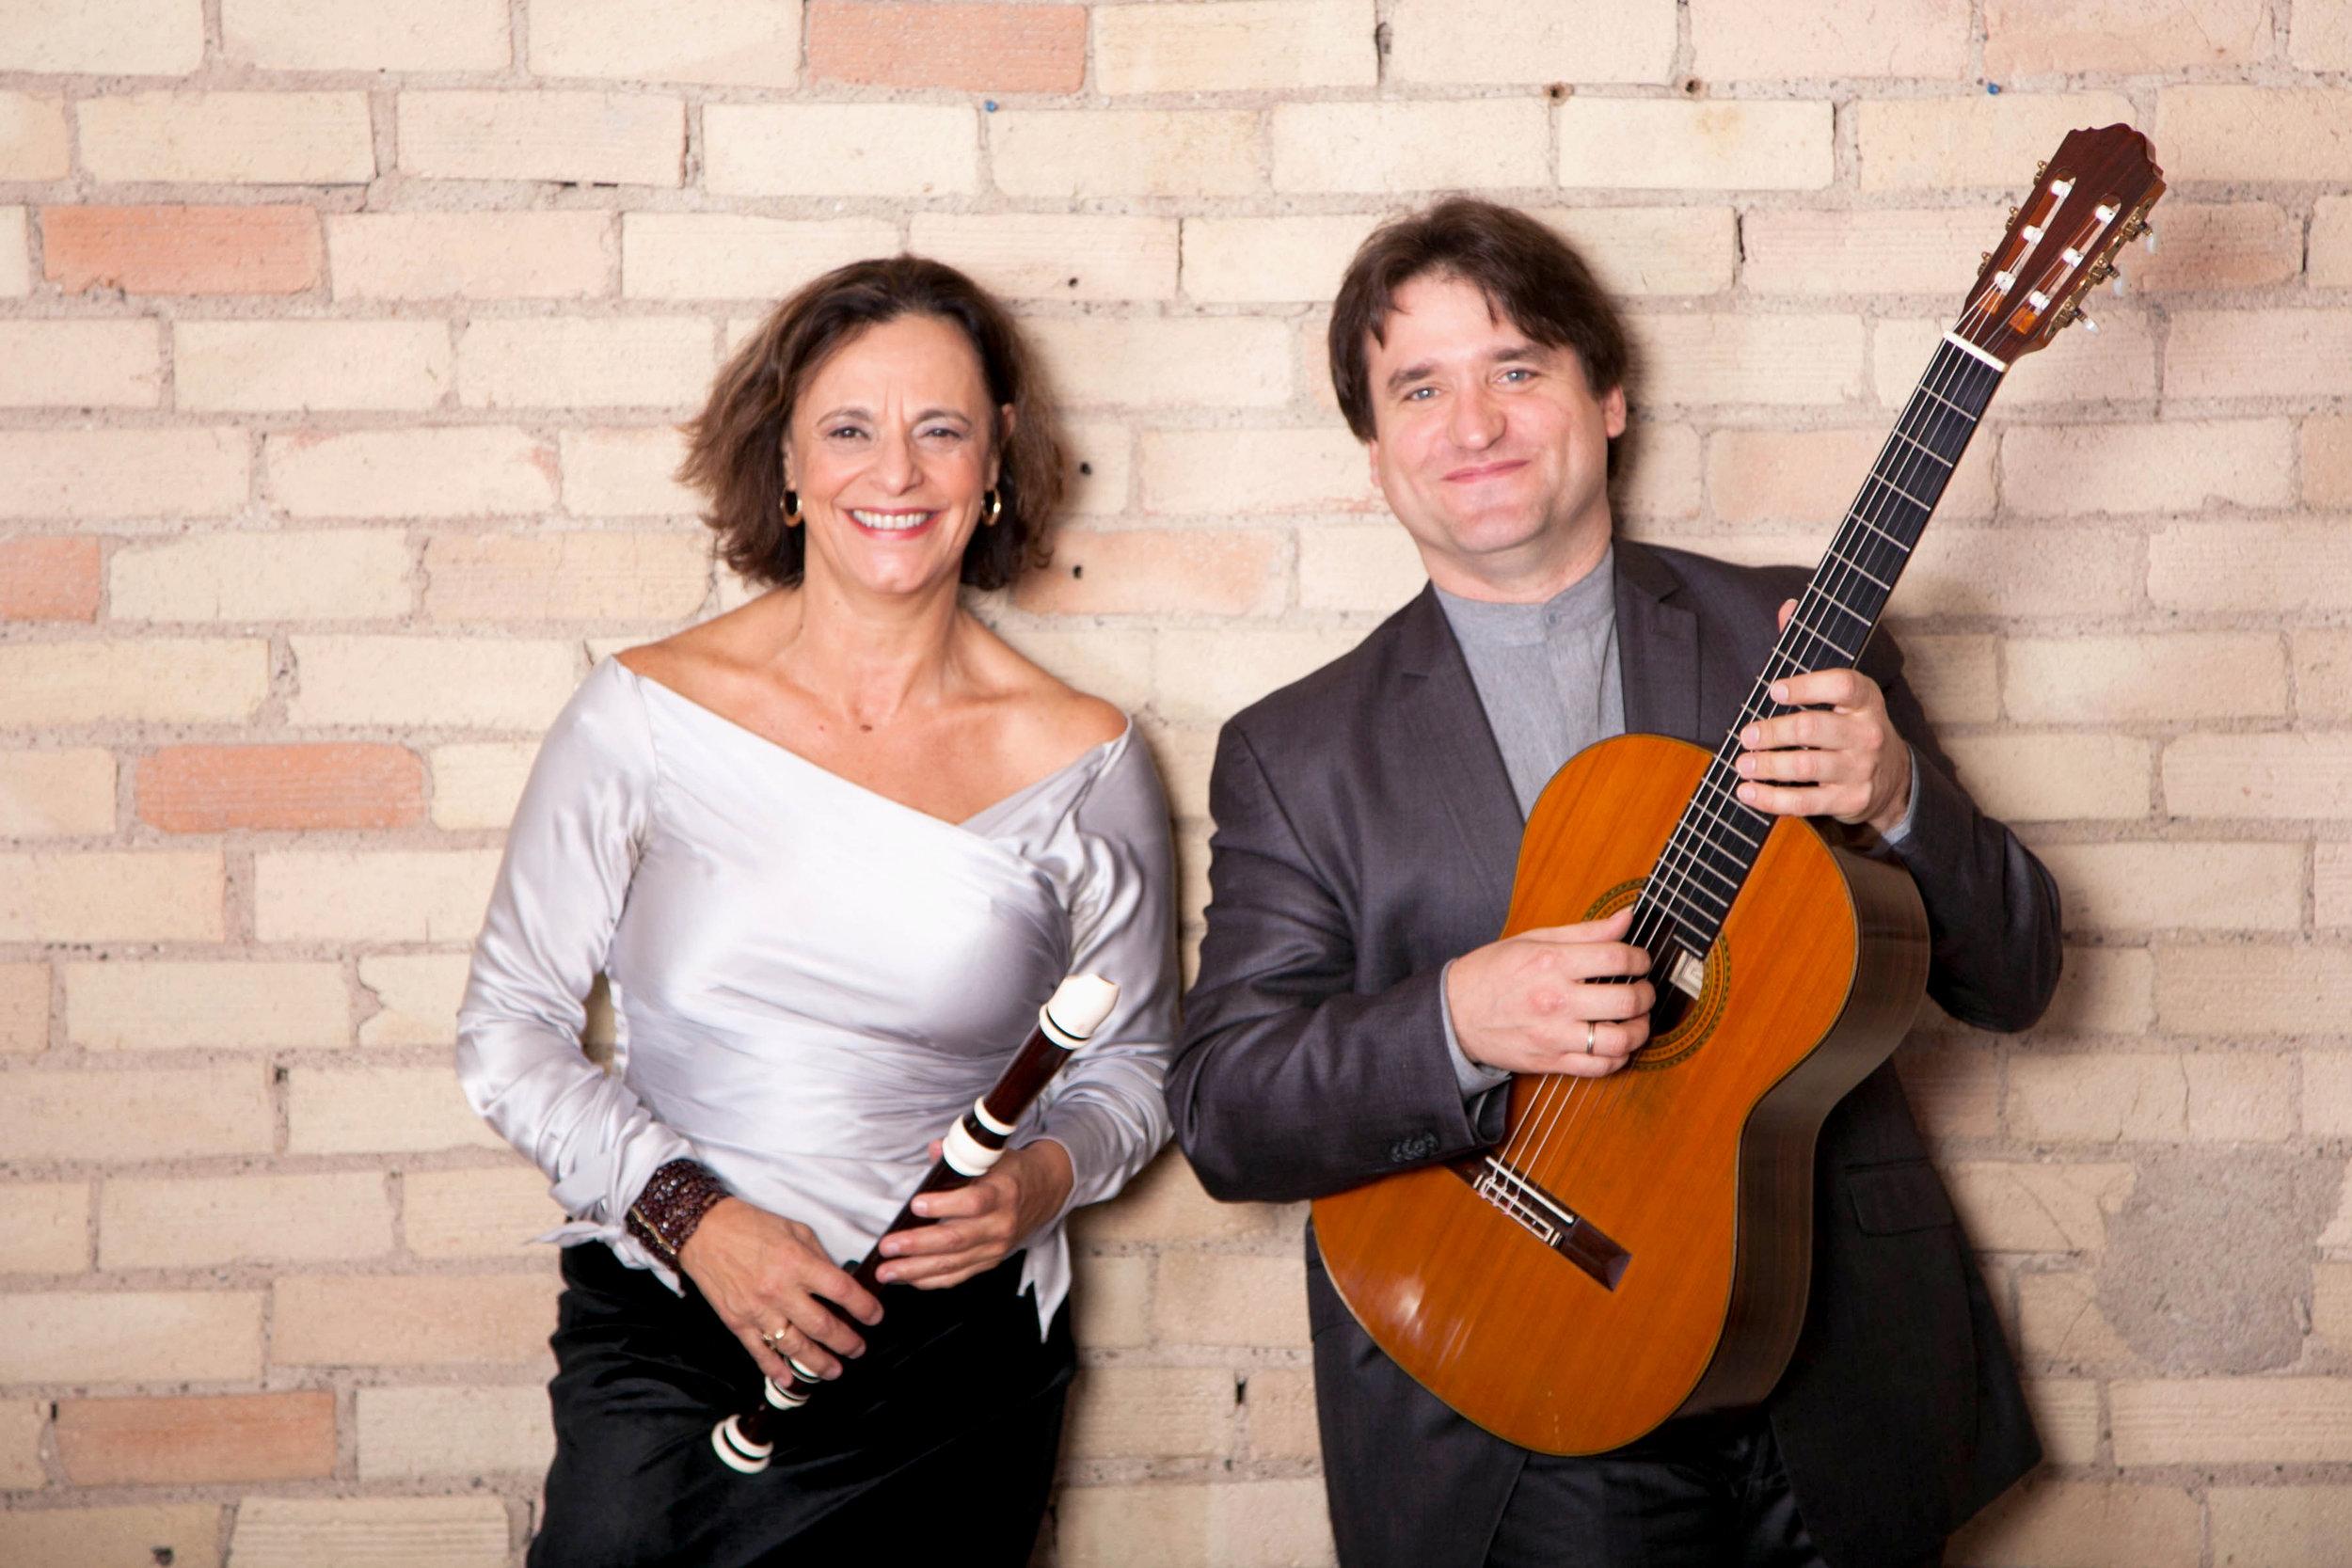 Clea Galhano and Rene Izquierdo